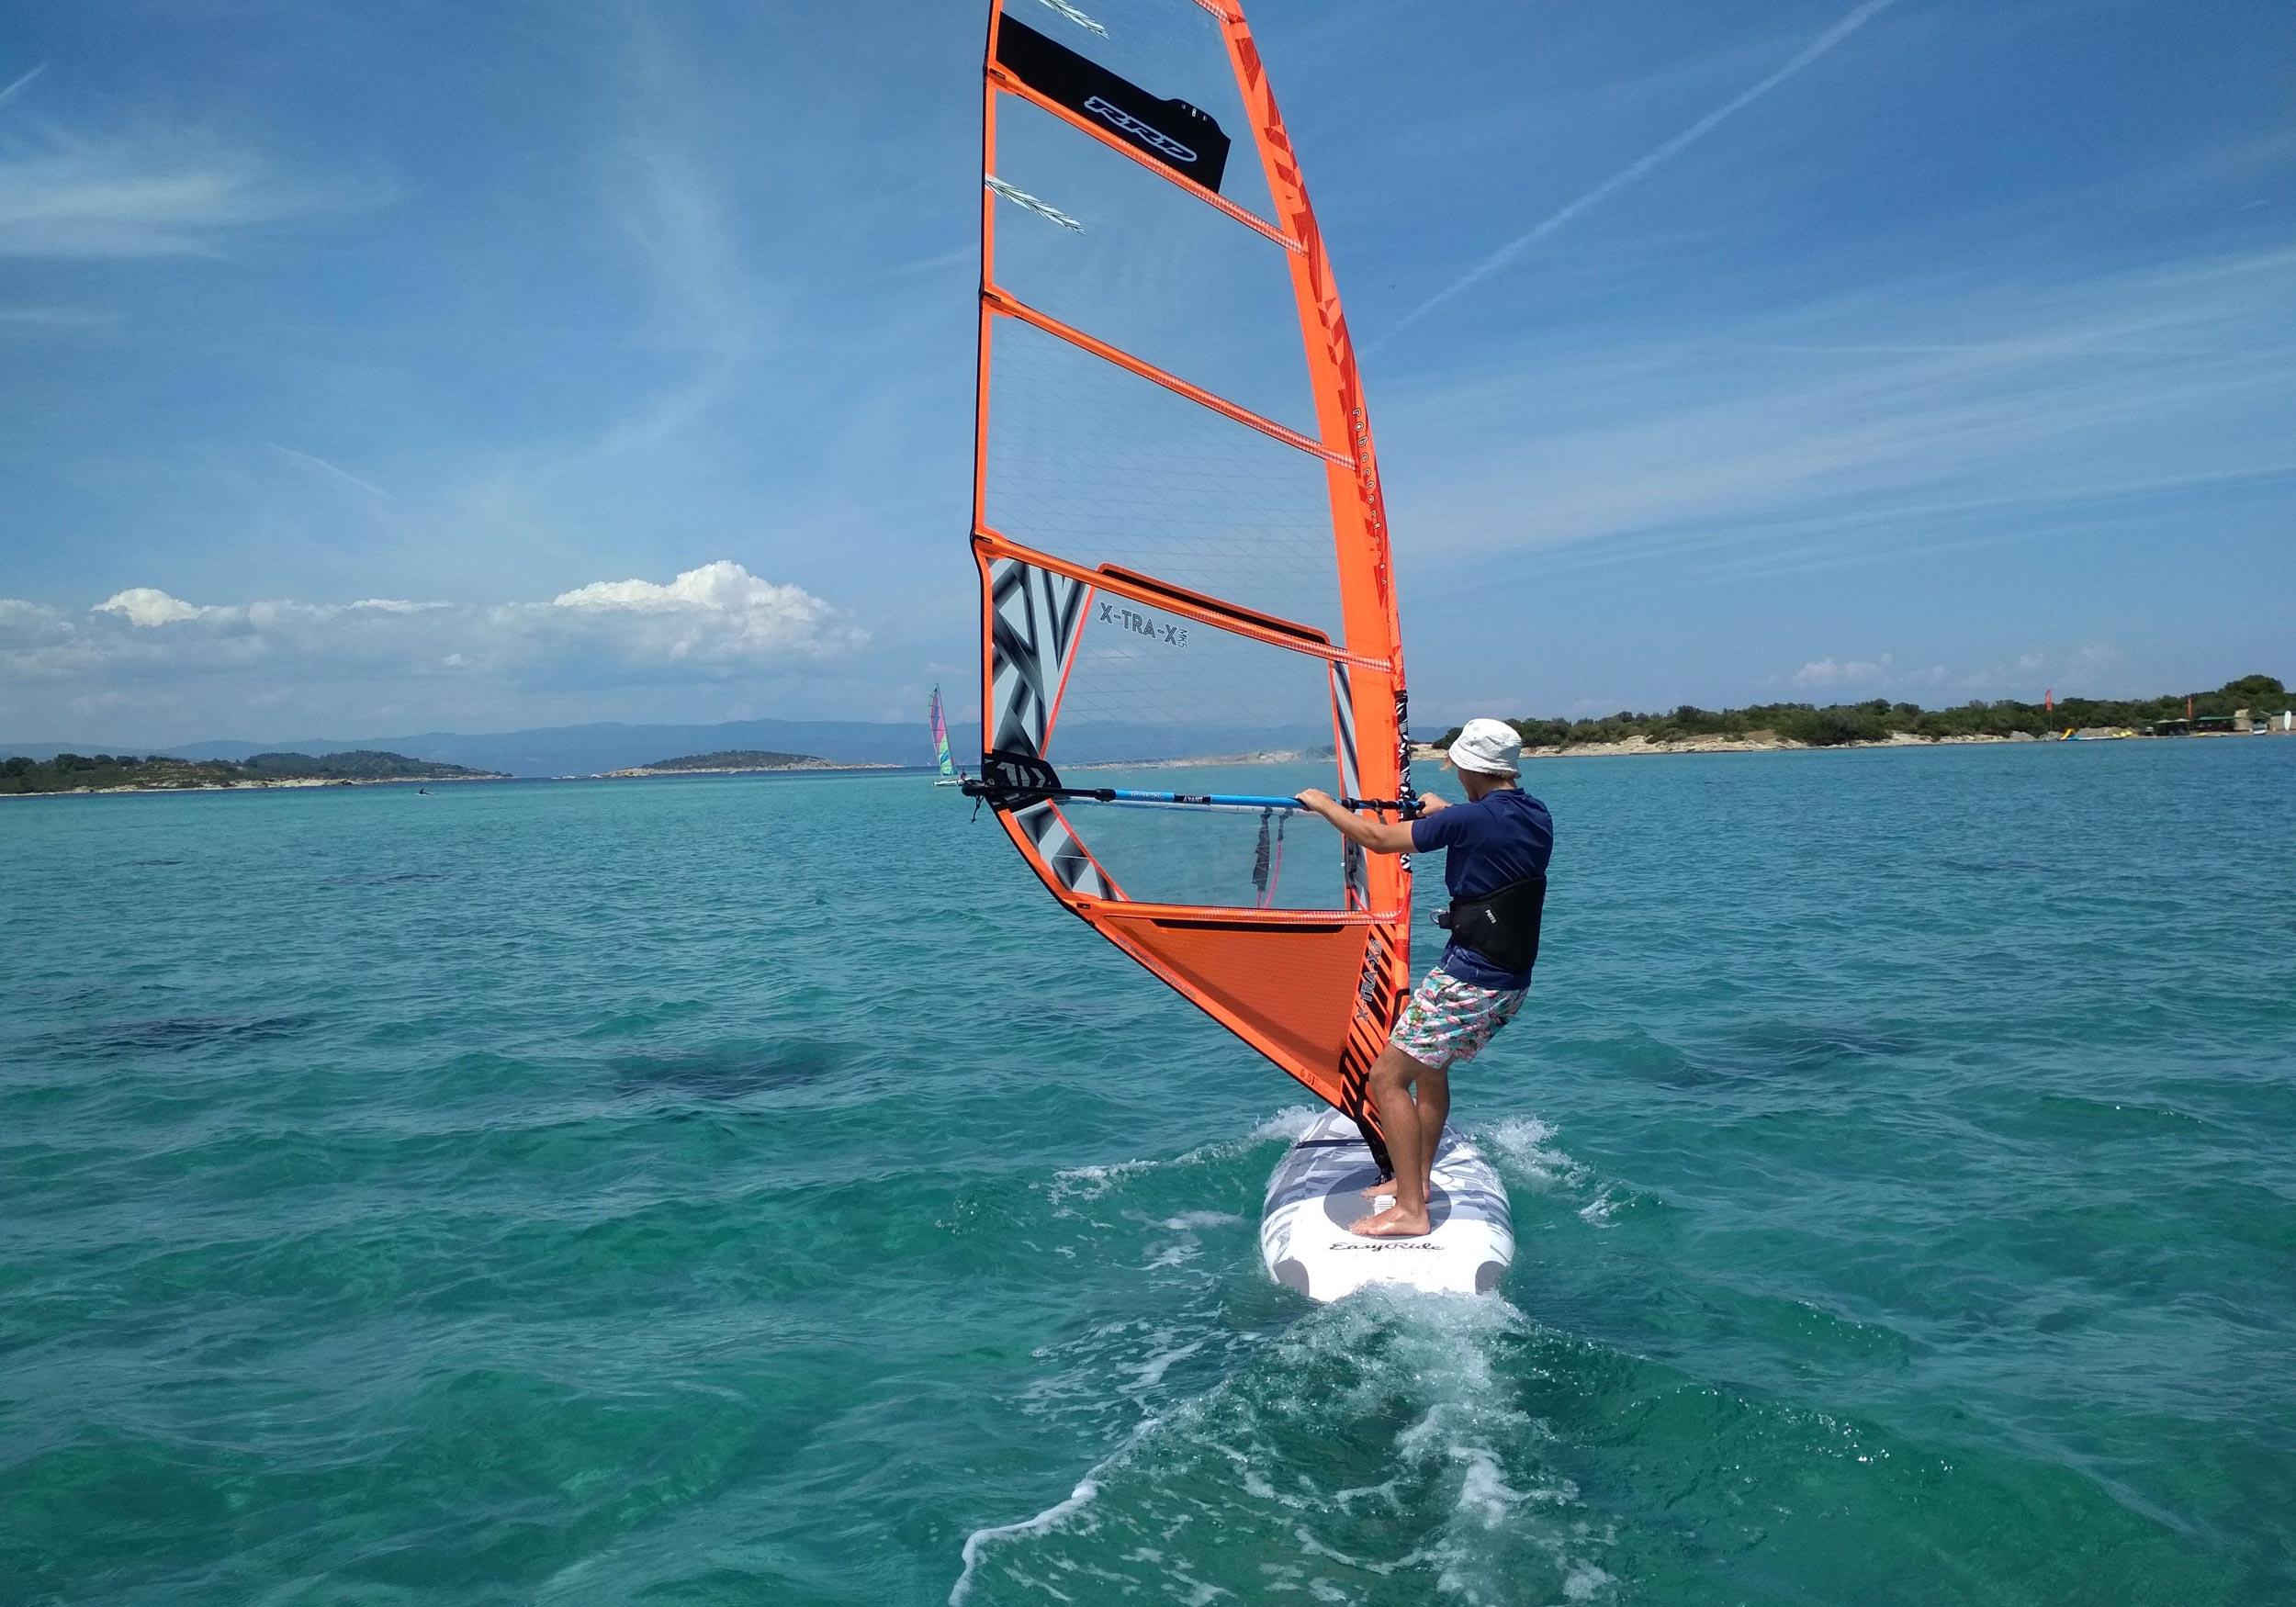 Person windsurfing.